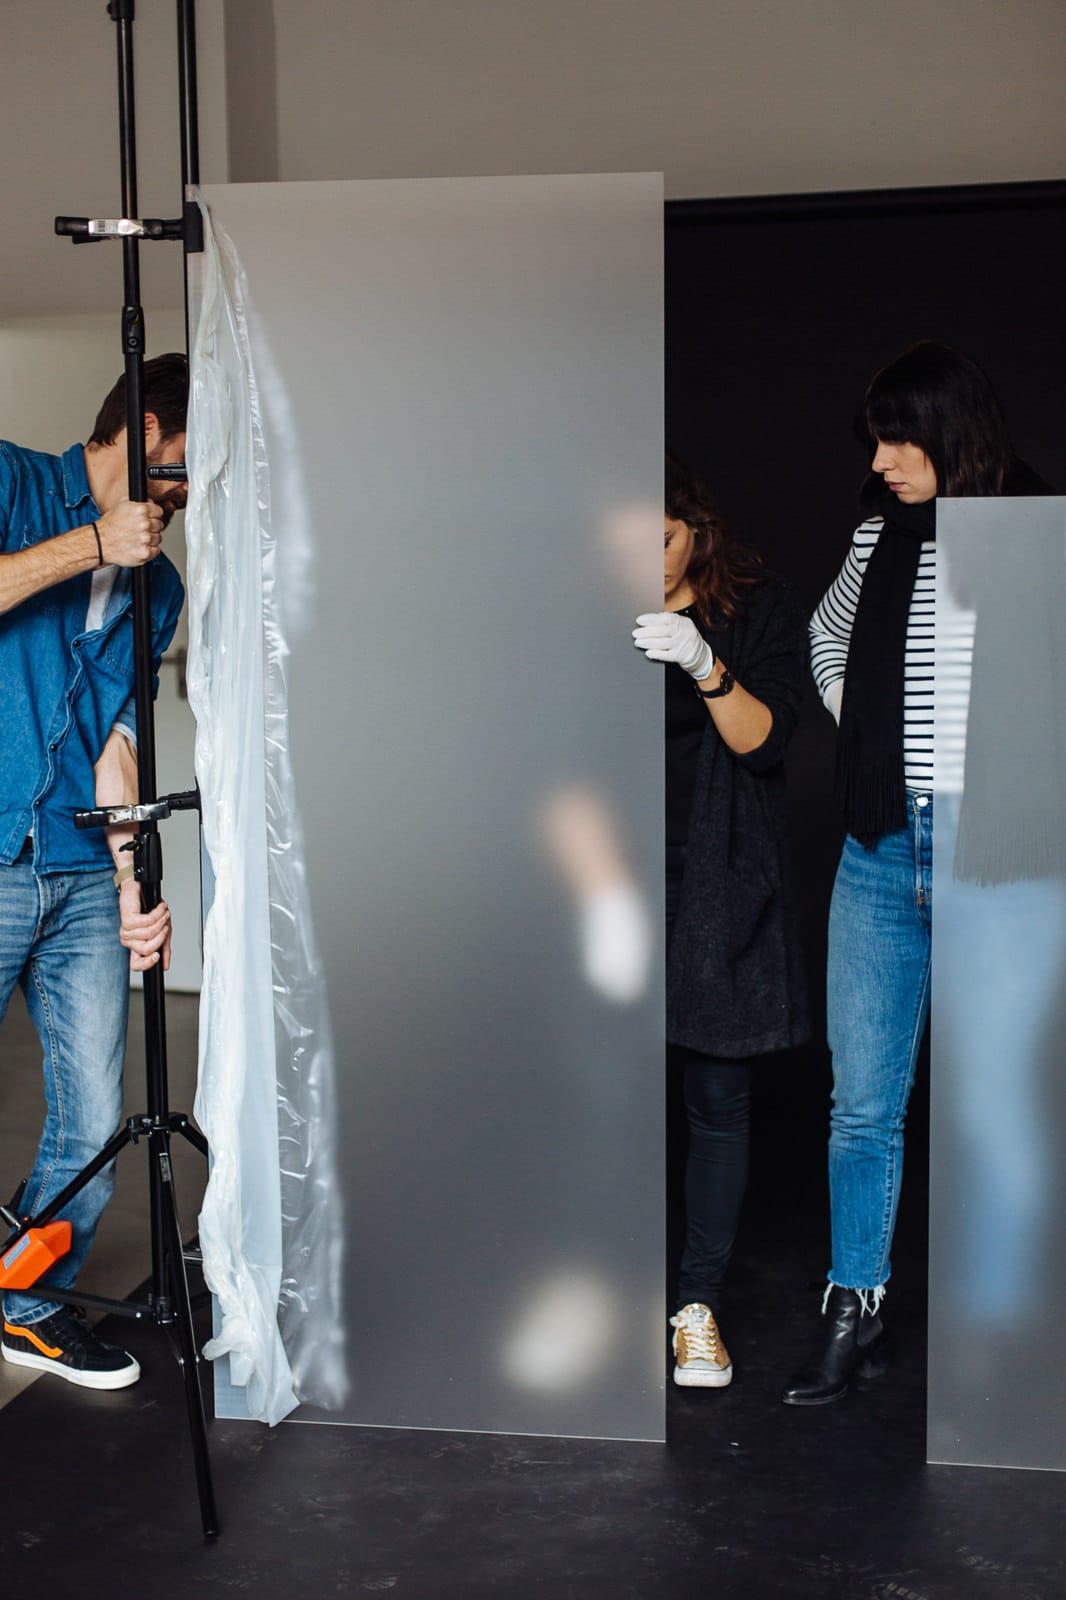 Mein L'Oréal Low Shampoo Fashion Shooting mit sisterMAG